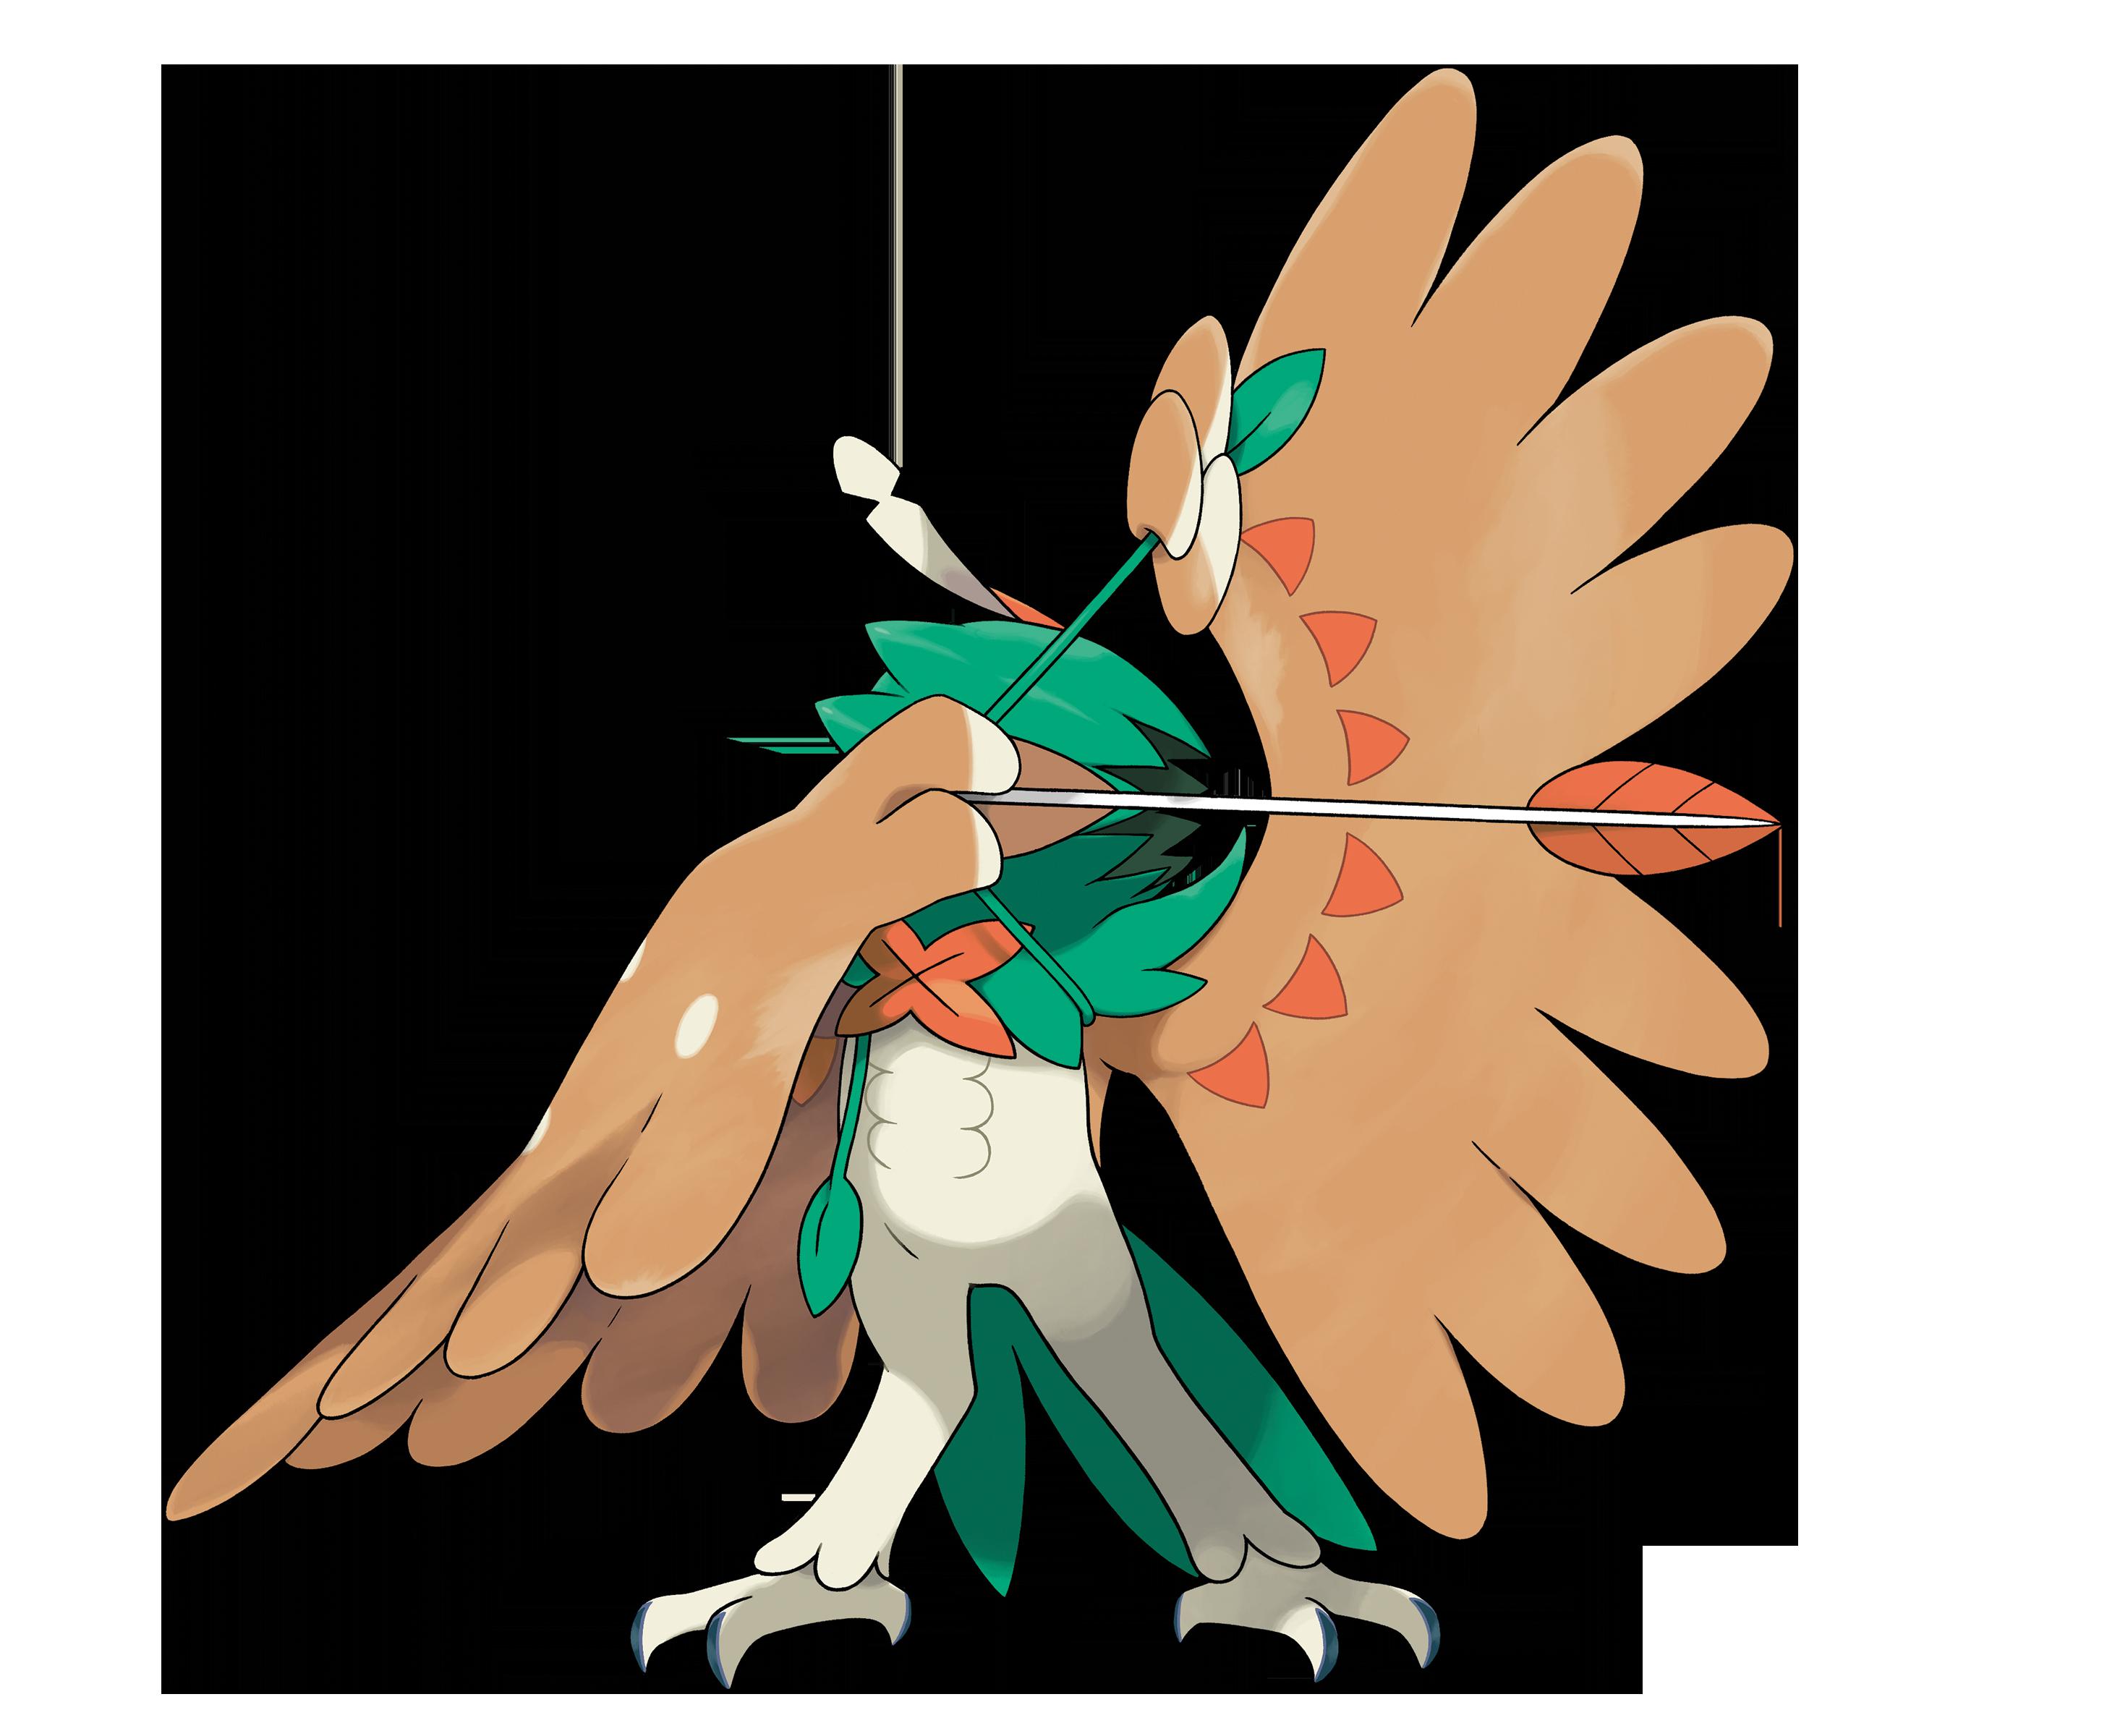 Feathers clipart arrow. Decidueye used sinister raid